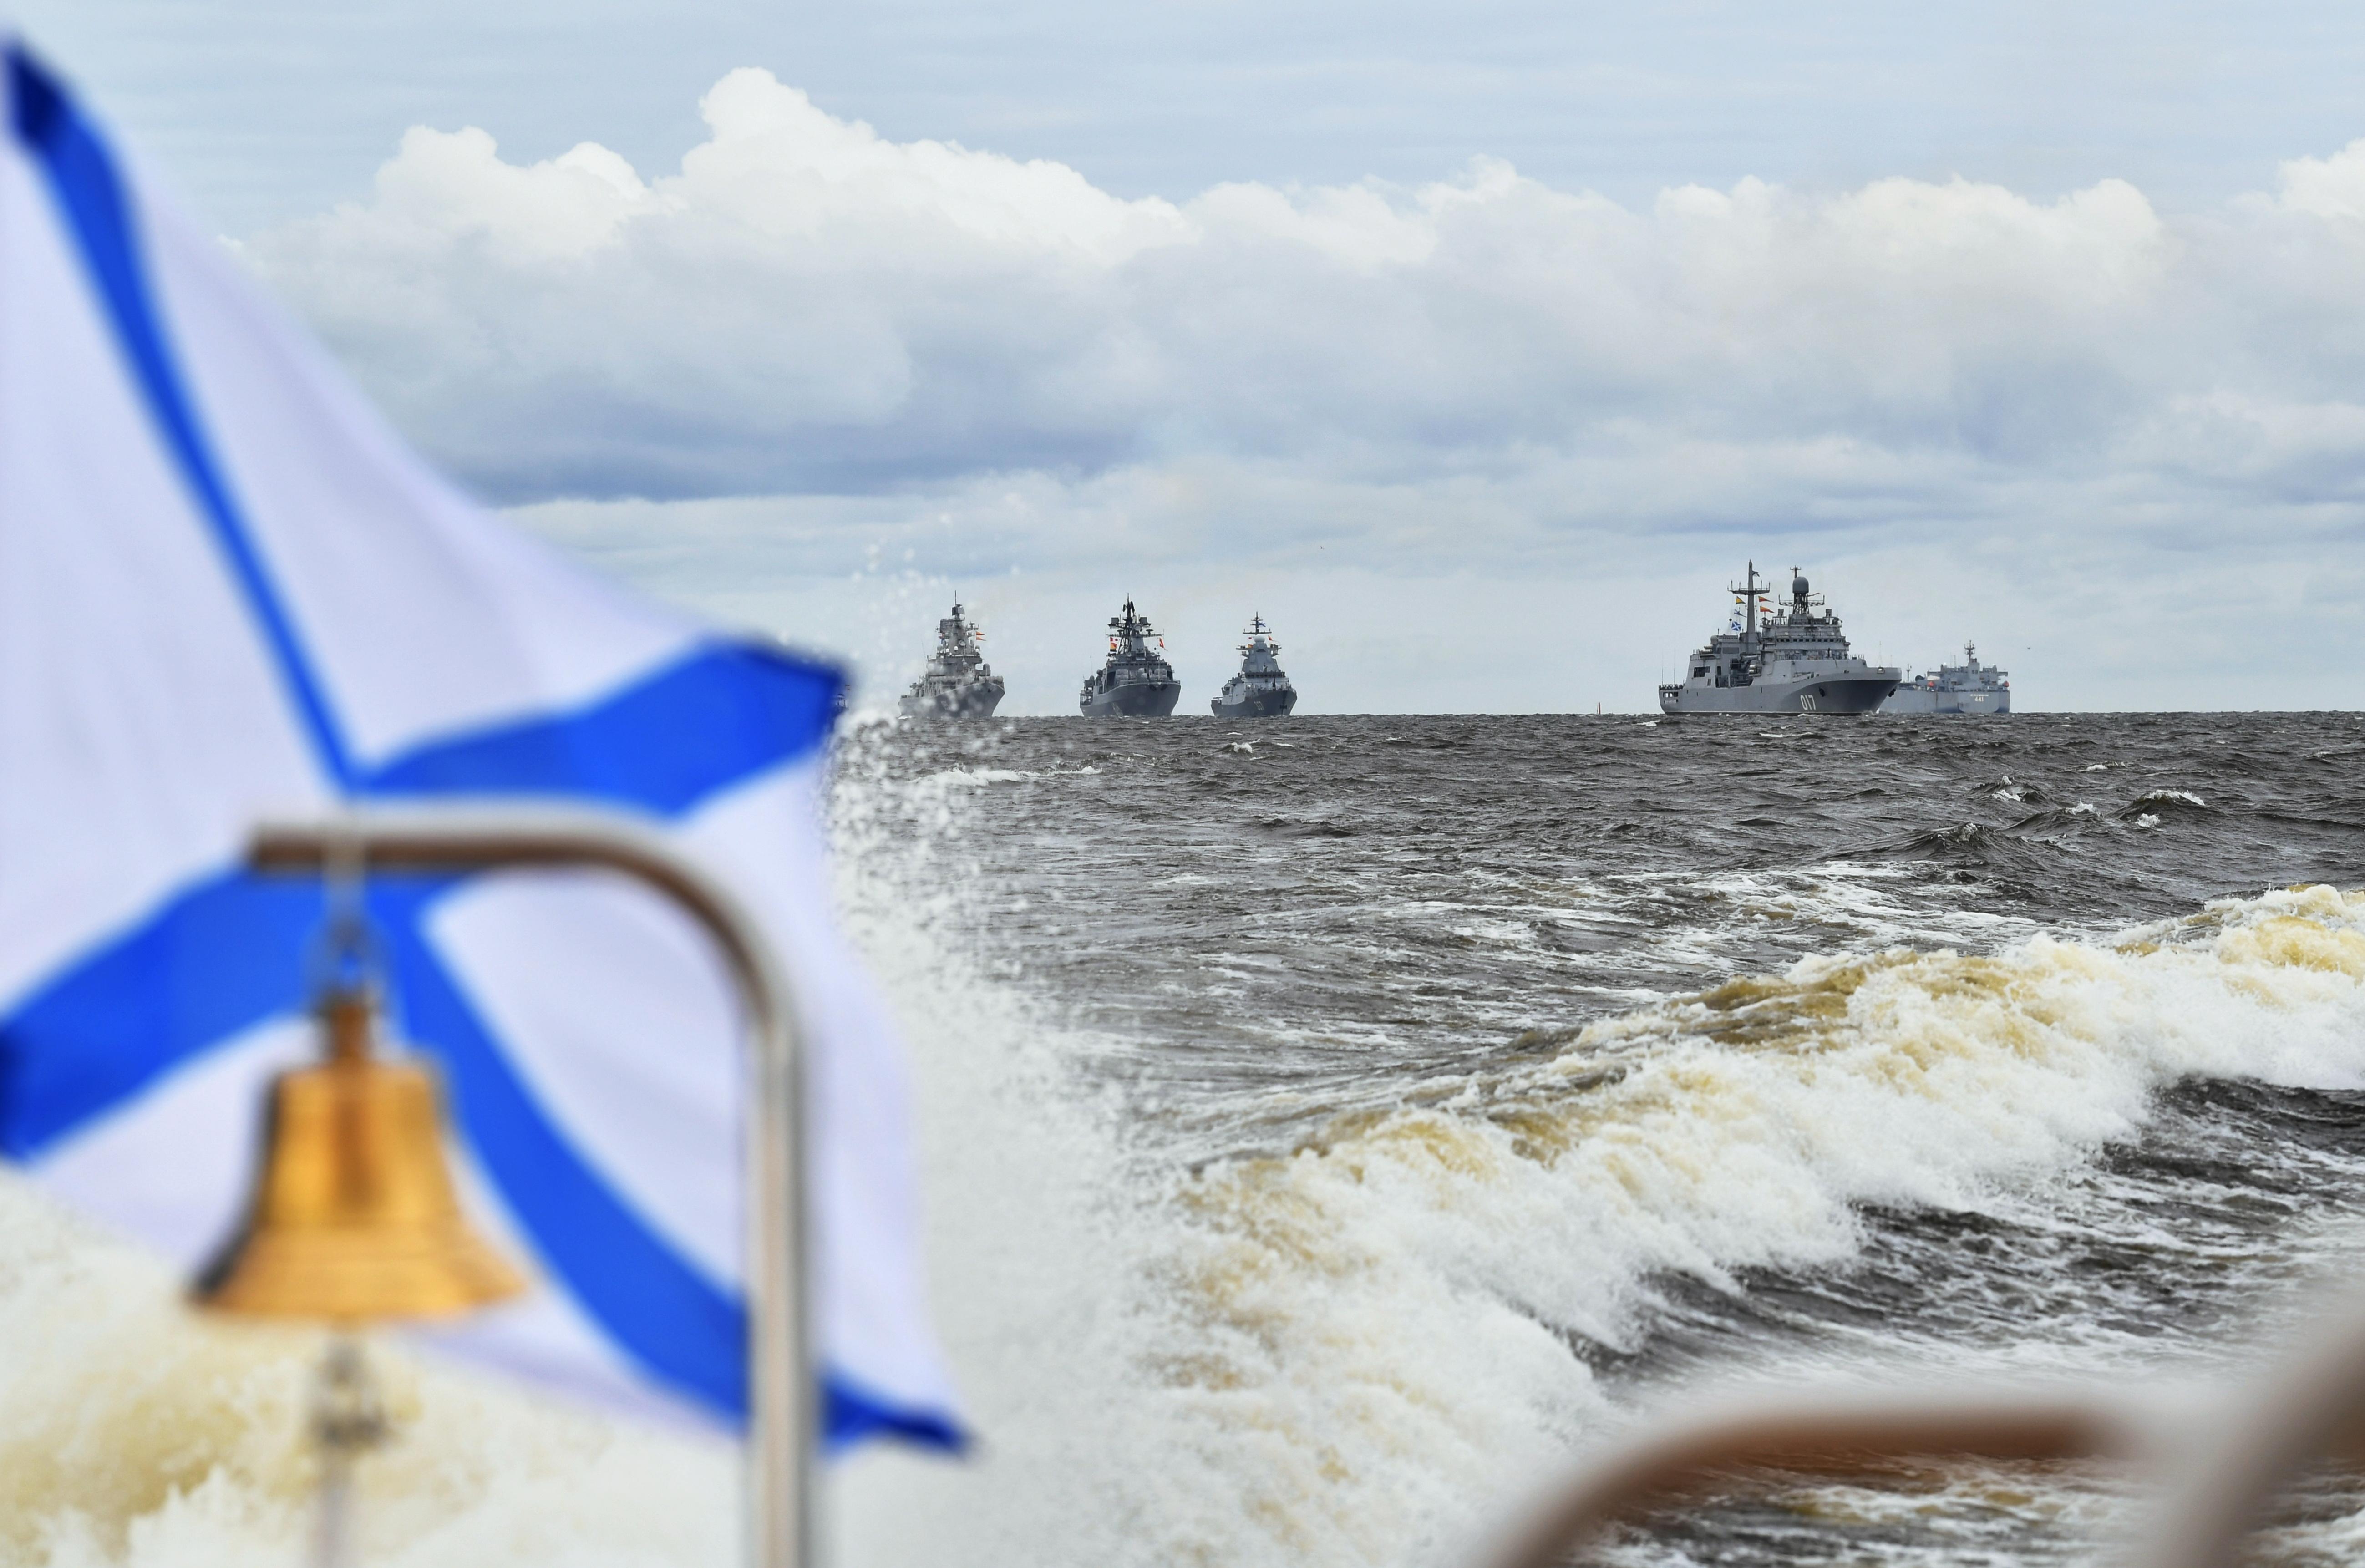 Russian Navy's warships are seen ready for the Navy Day parade in Saint Petersburg, Russia July 25, 2021. Sputnik/Aleksey Nikolskyi/Kremlin via REUTERS